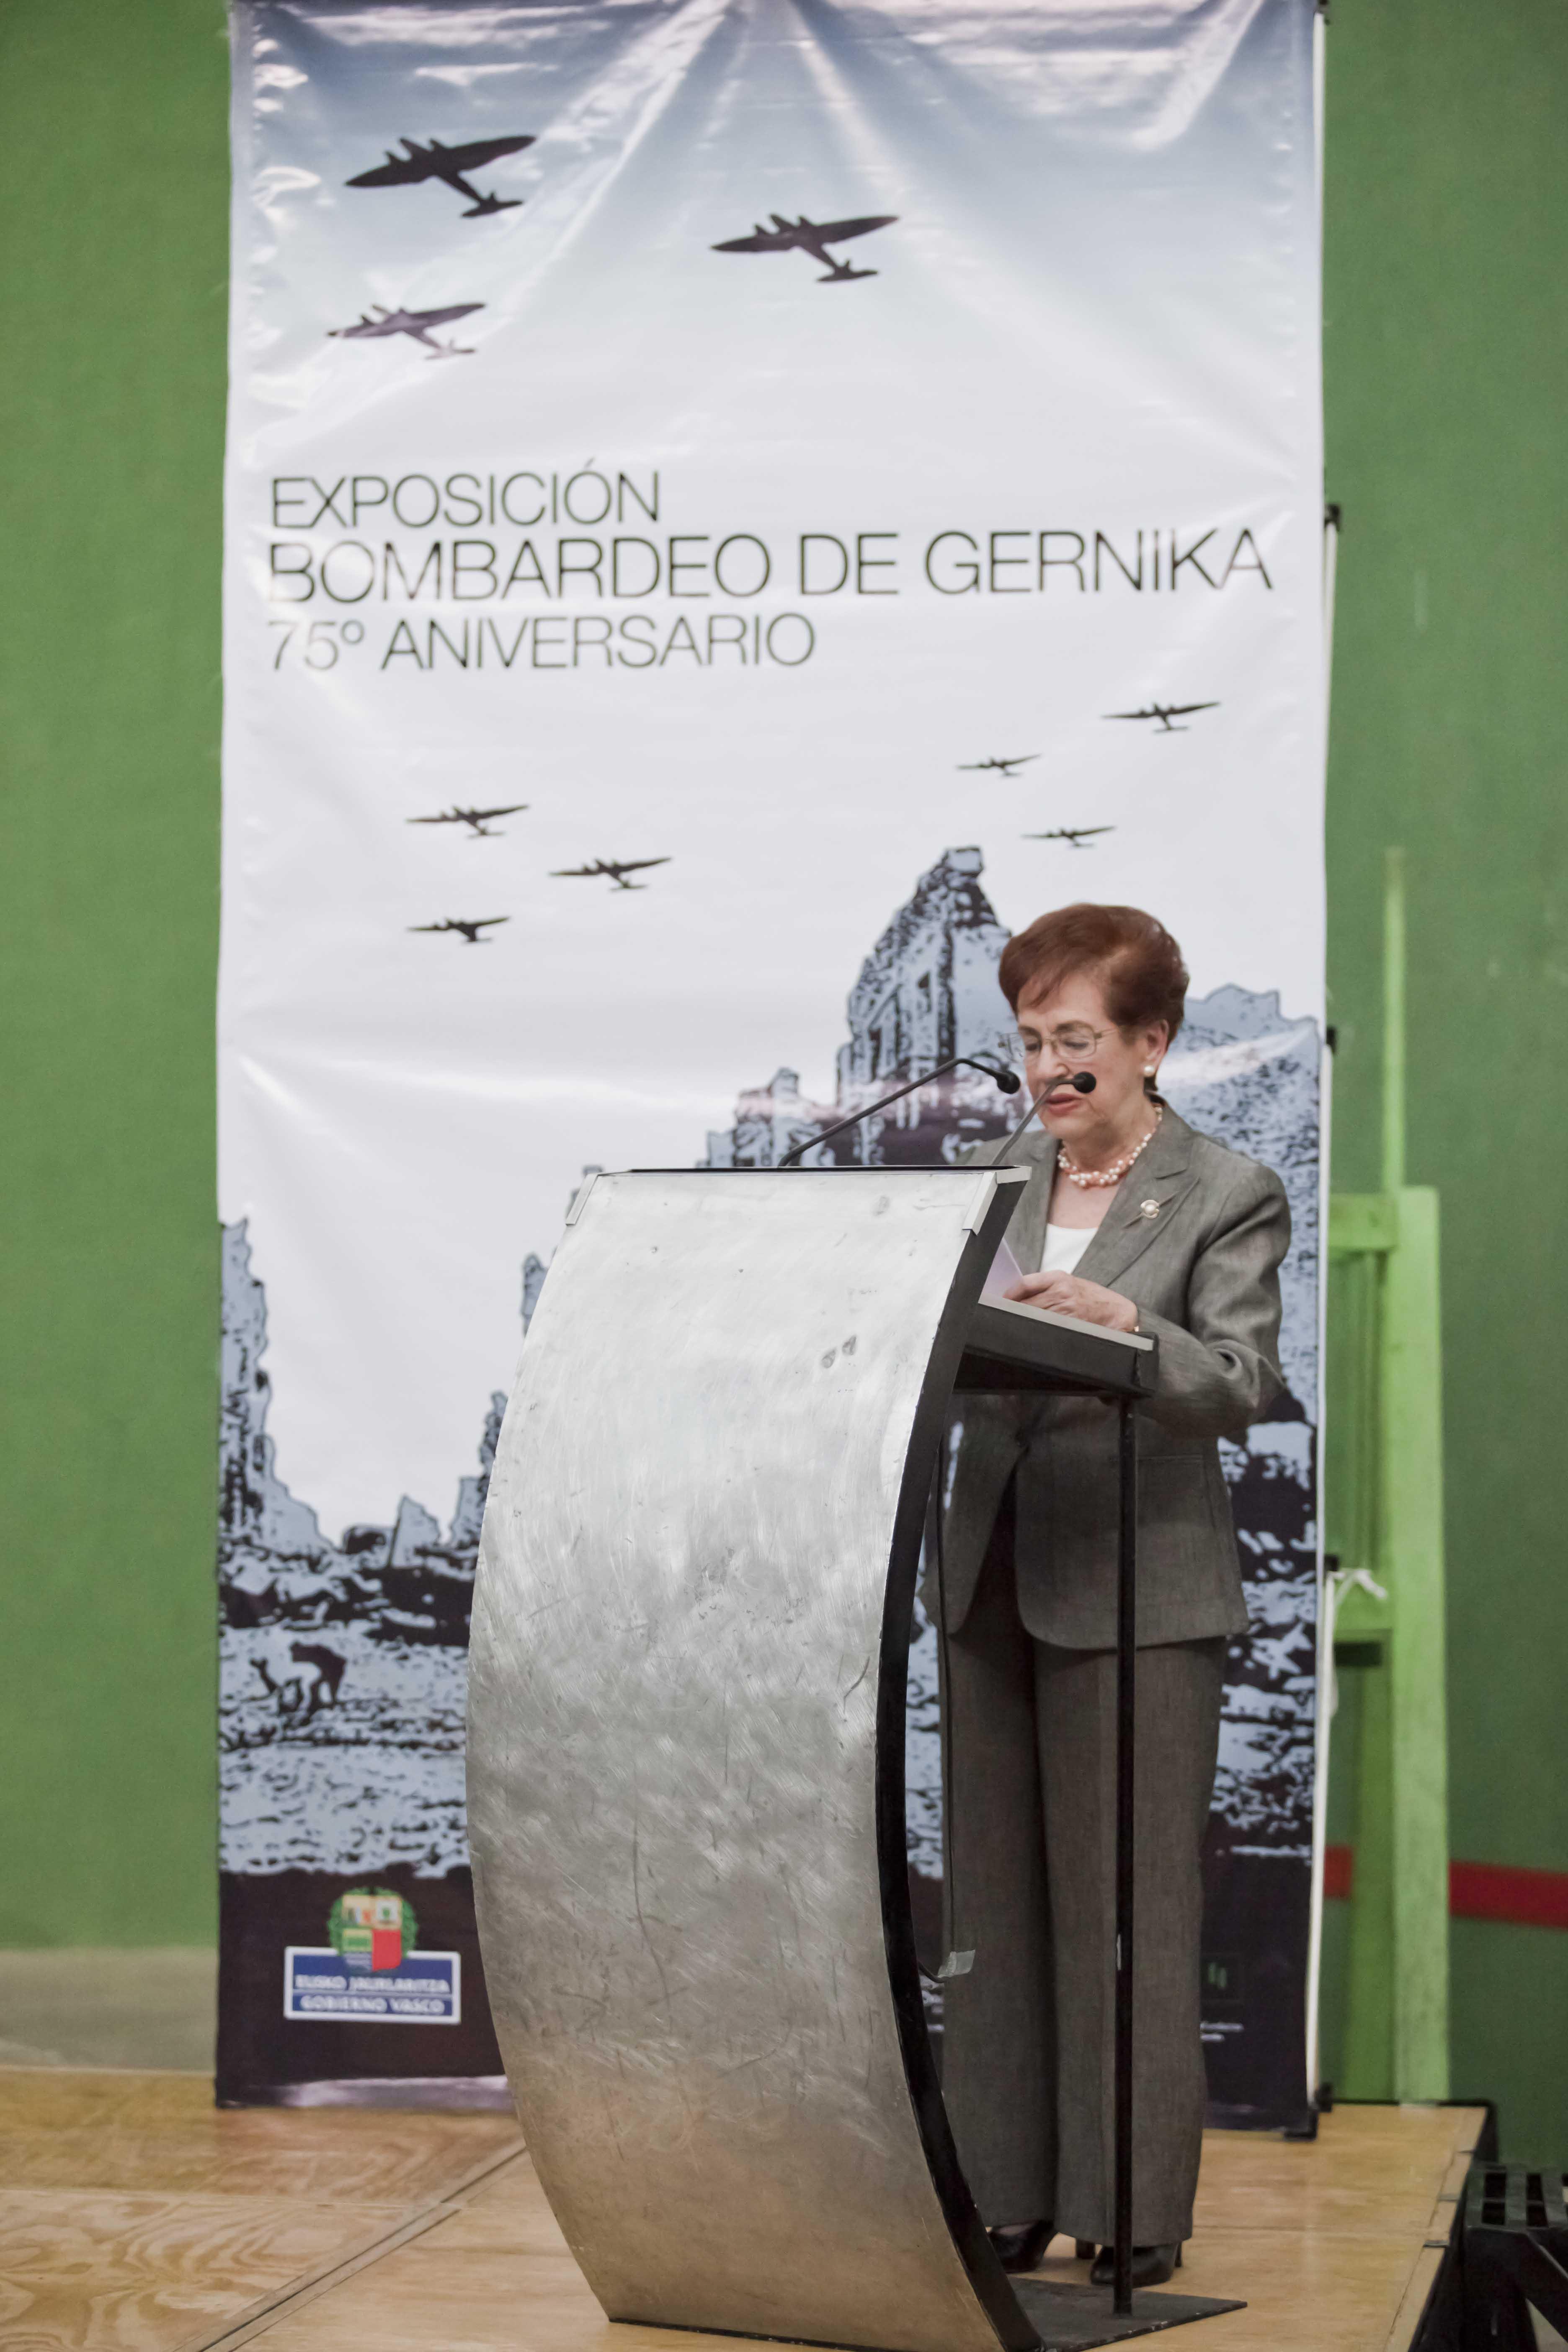 expo_bombardeo_gernika_17.jpg